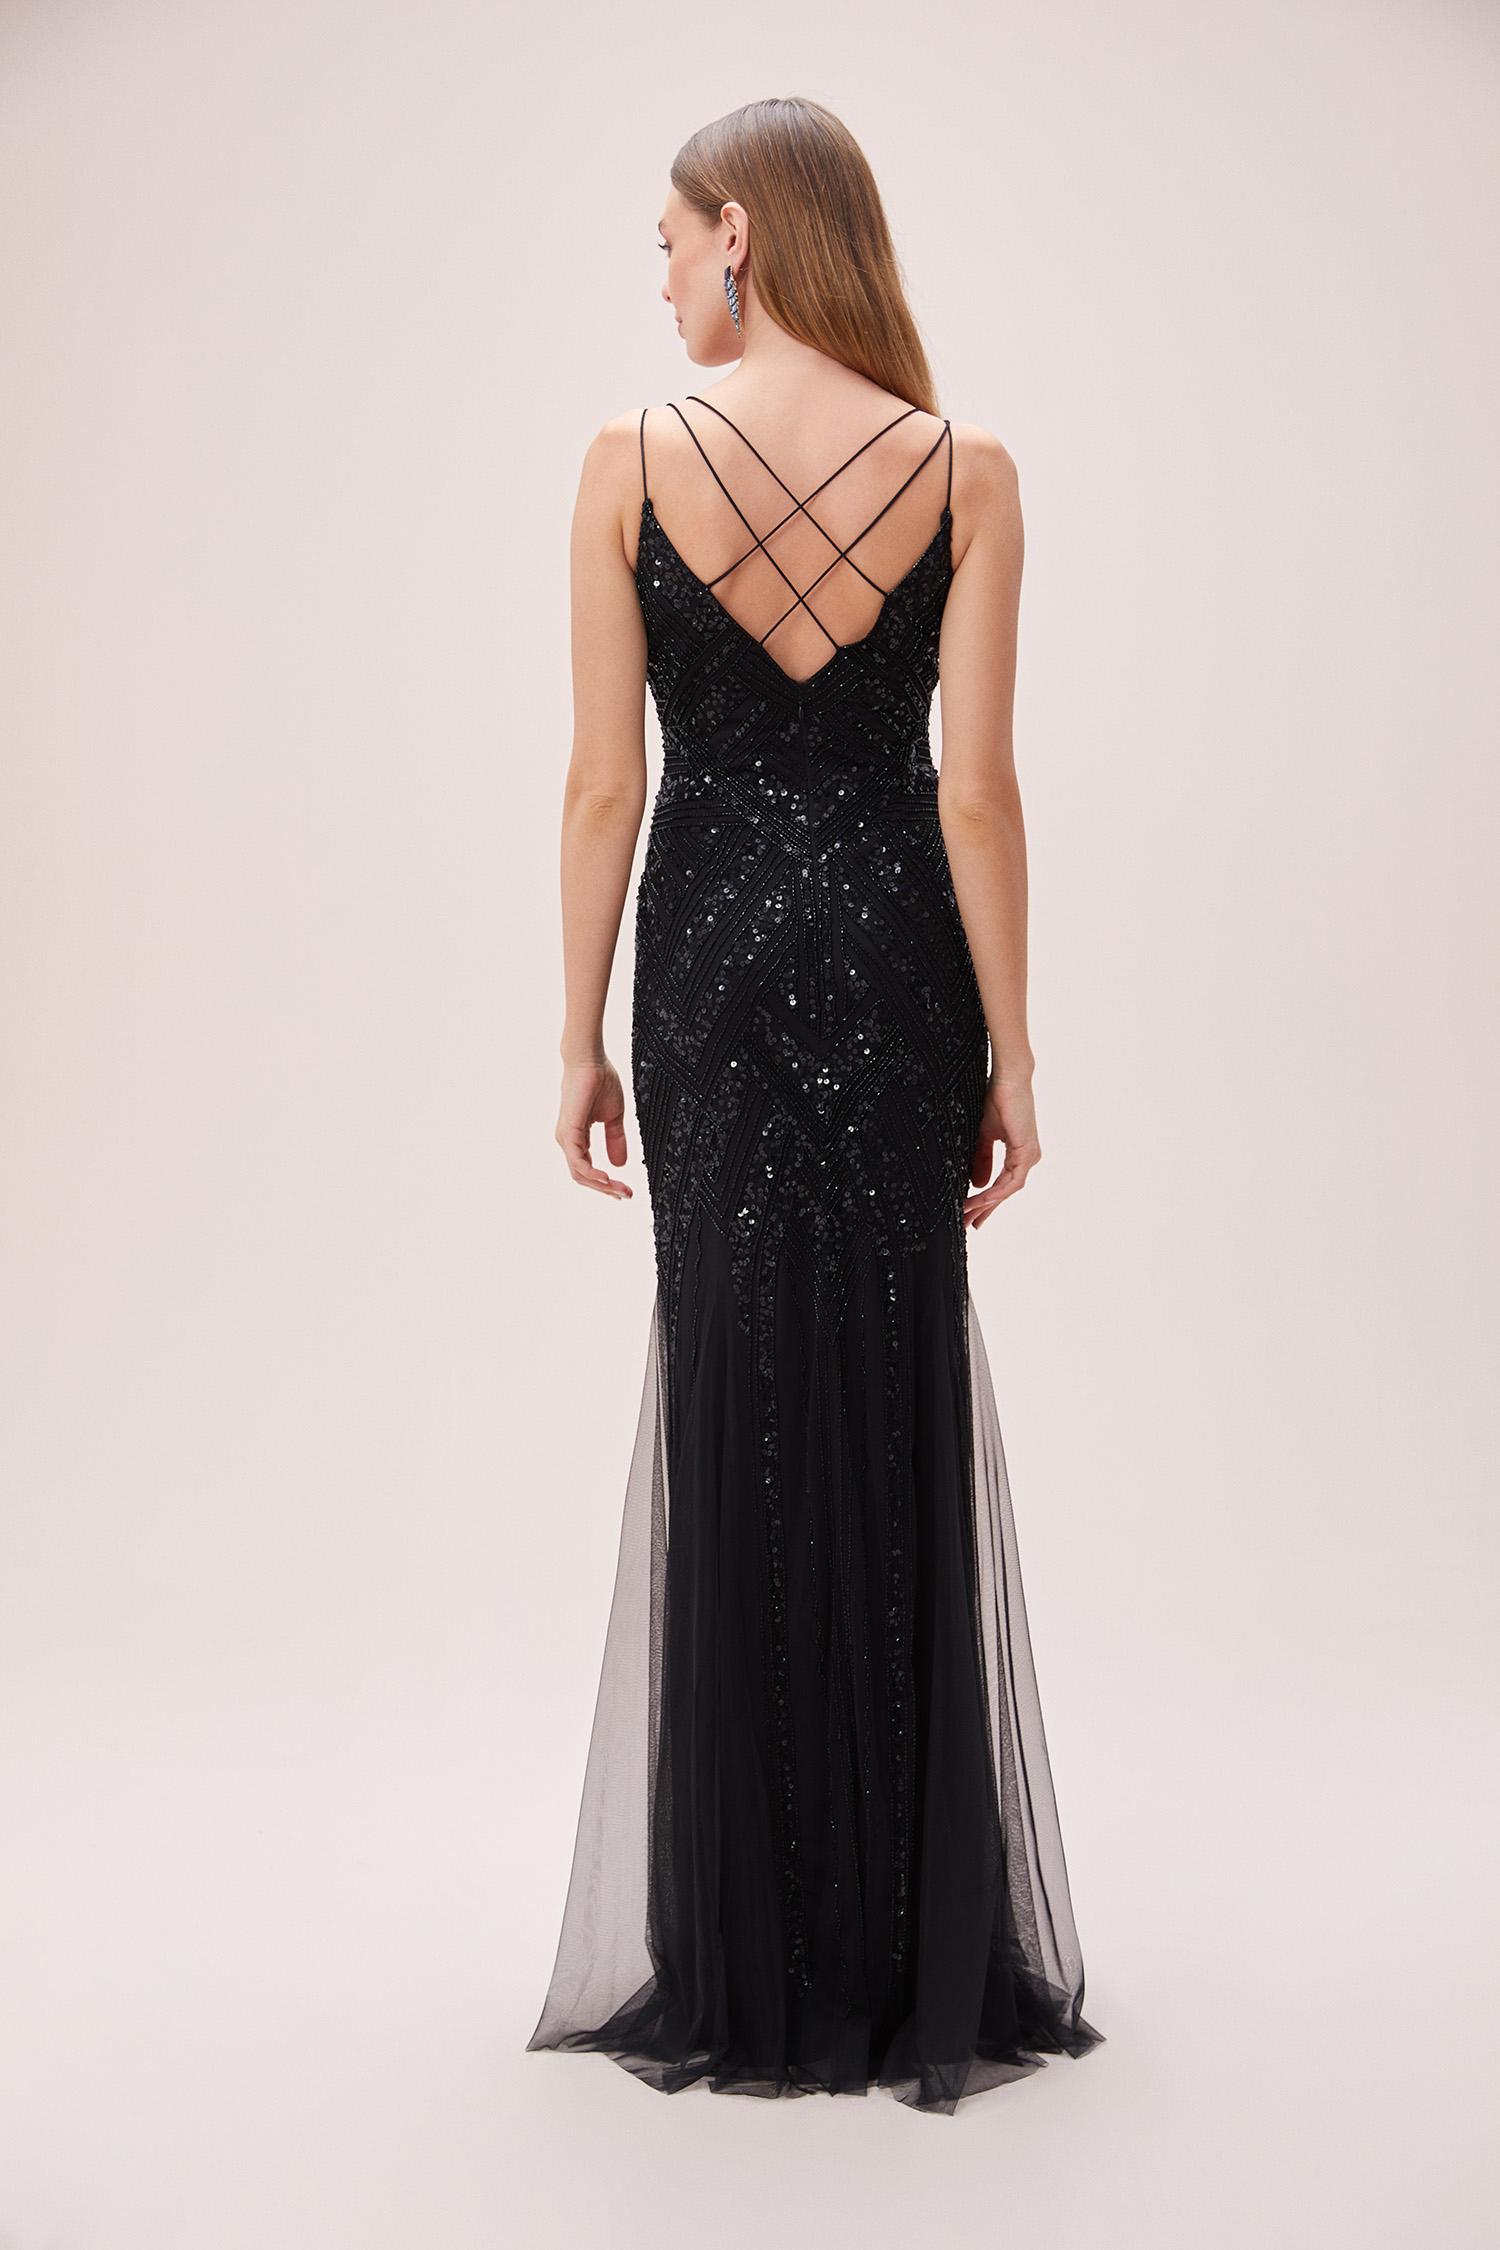 Siyah Payet İşlemeli V Yaka Askılı Abiye Elbise - Thumbnail